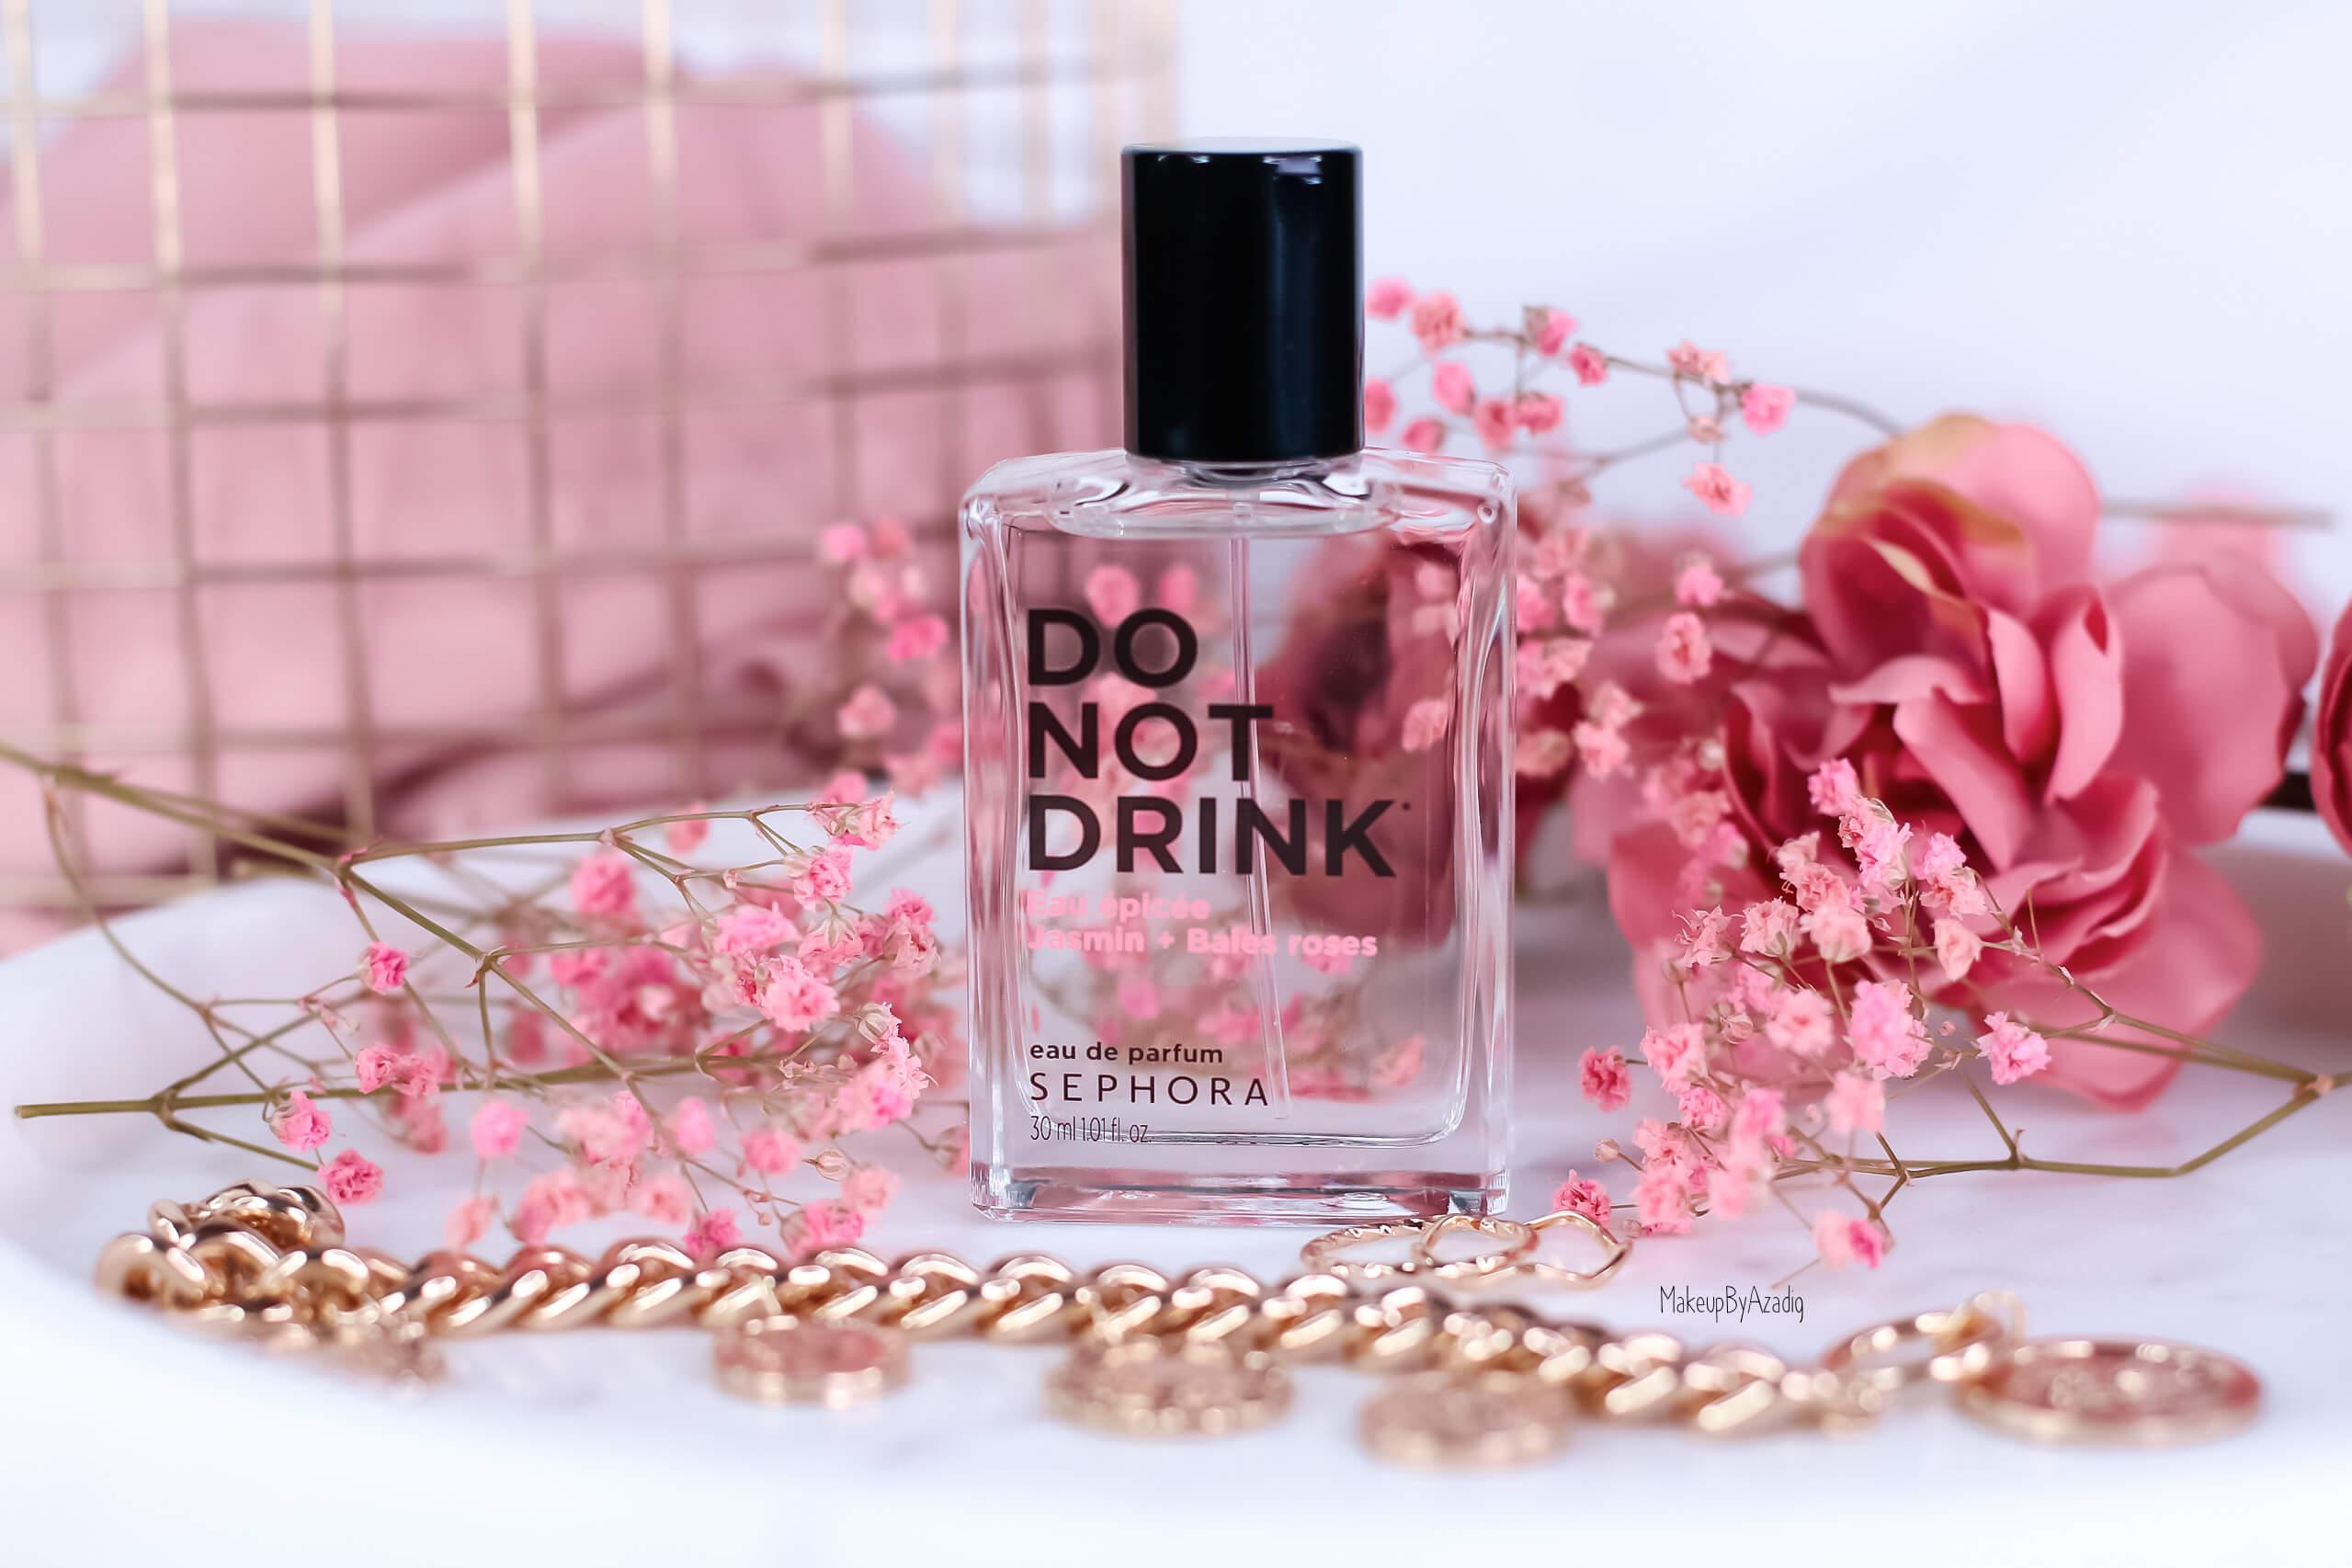 parfum do not drink sephora